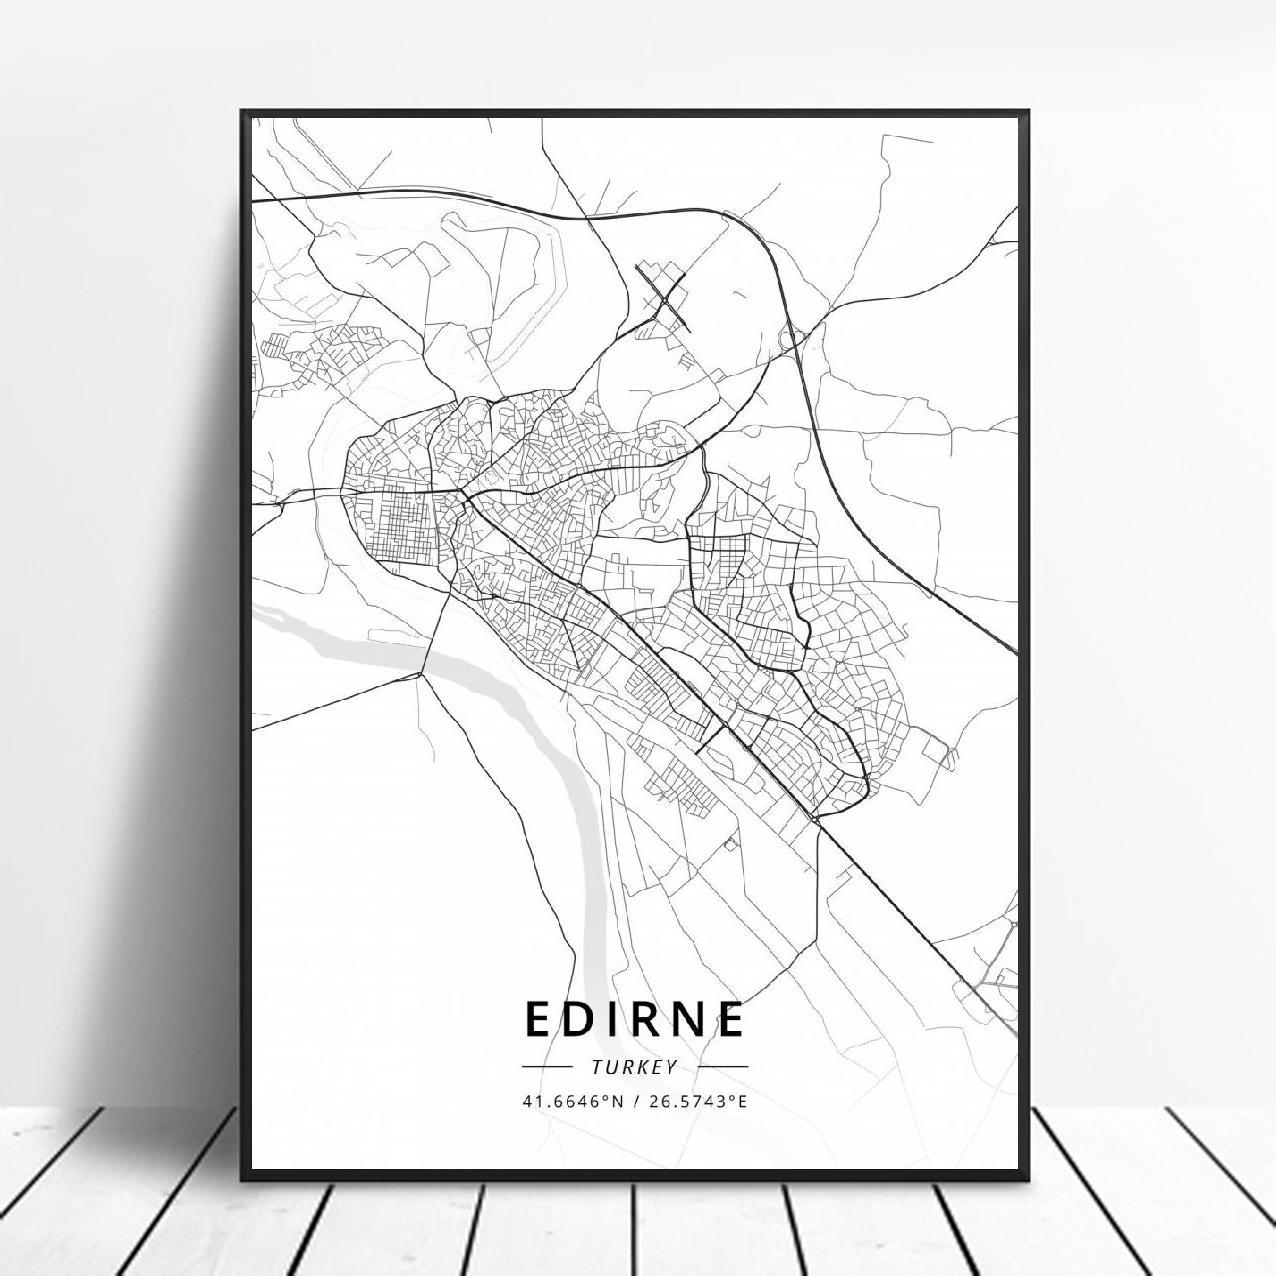 Edirne antalya mugla mersin esmirna istambul adana ancara turquia lona mapa da arte cartaz